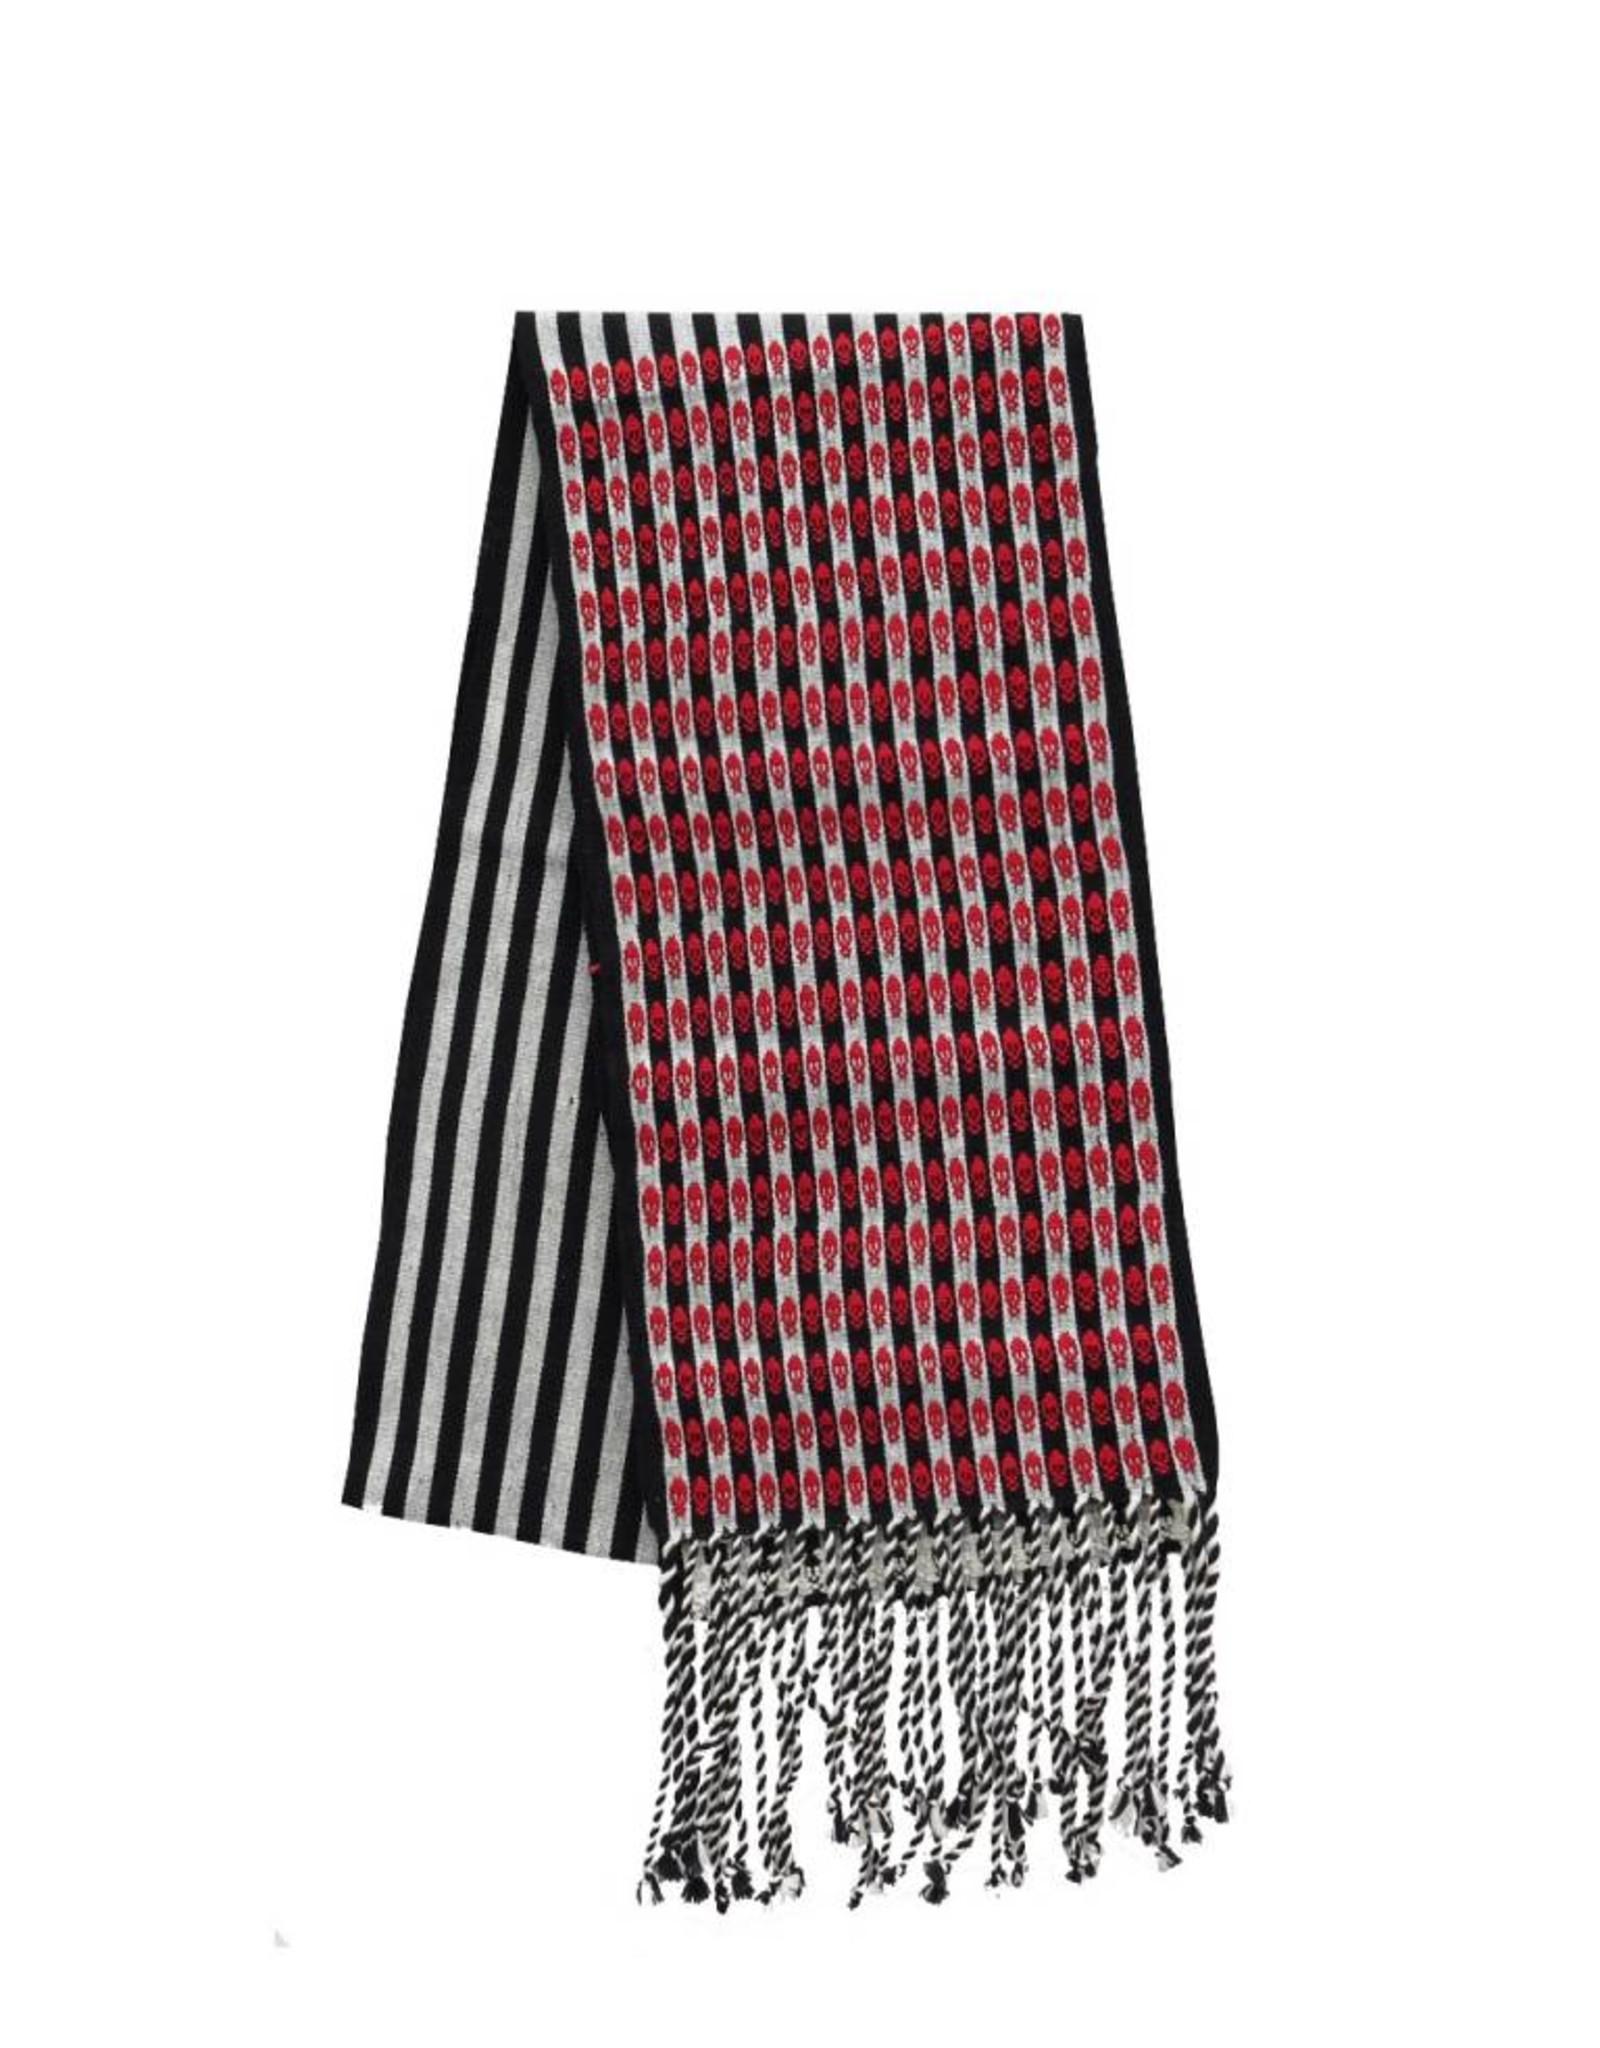 TALLER 67 bufanda lineal con brocado de calaveras tejido en telar de cintura NEGRO CRUDO, CRUDO ROJO TALLER 67